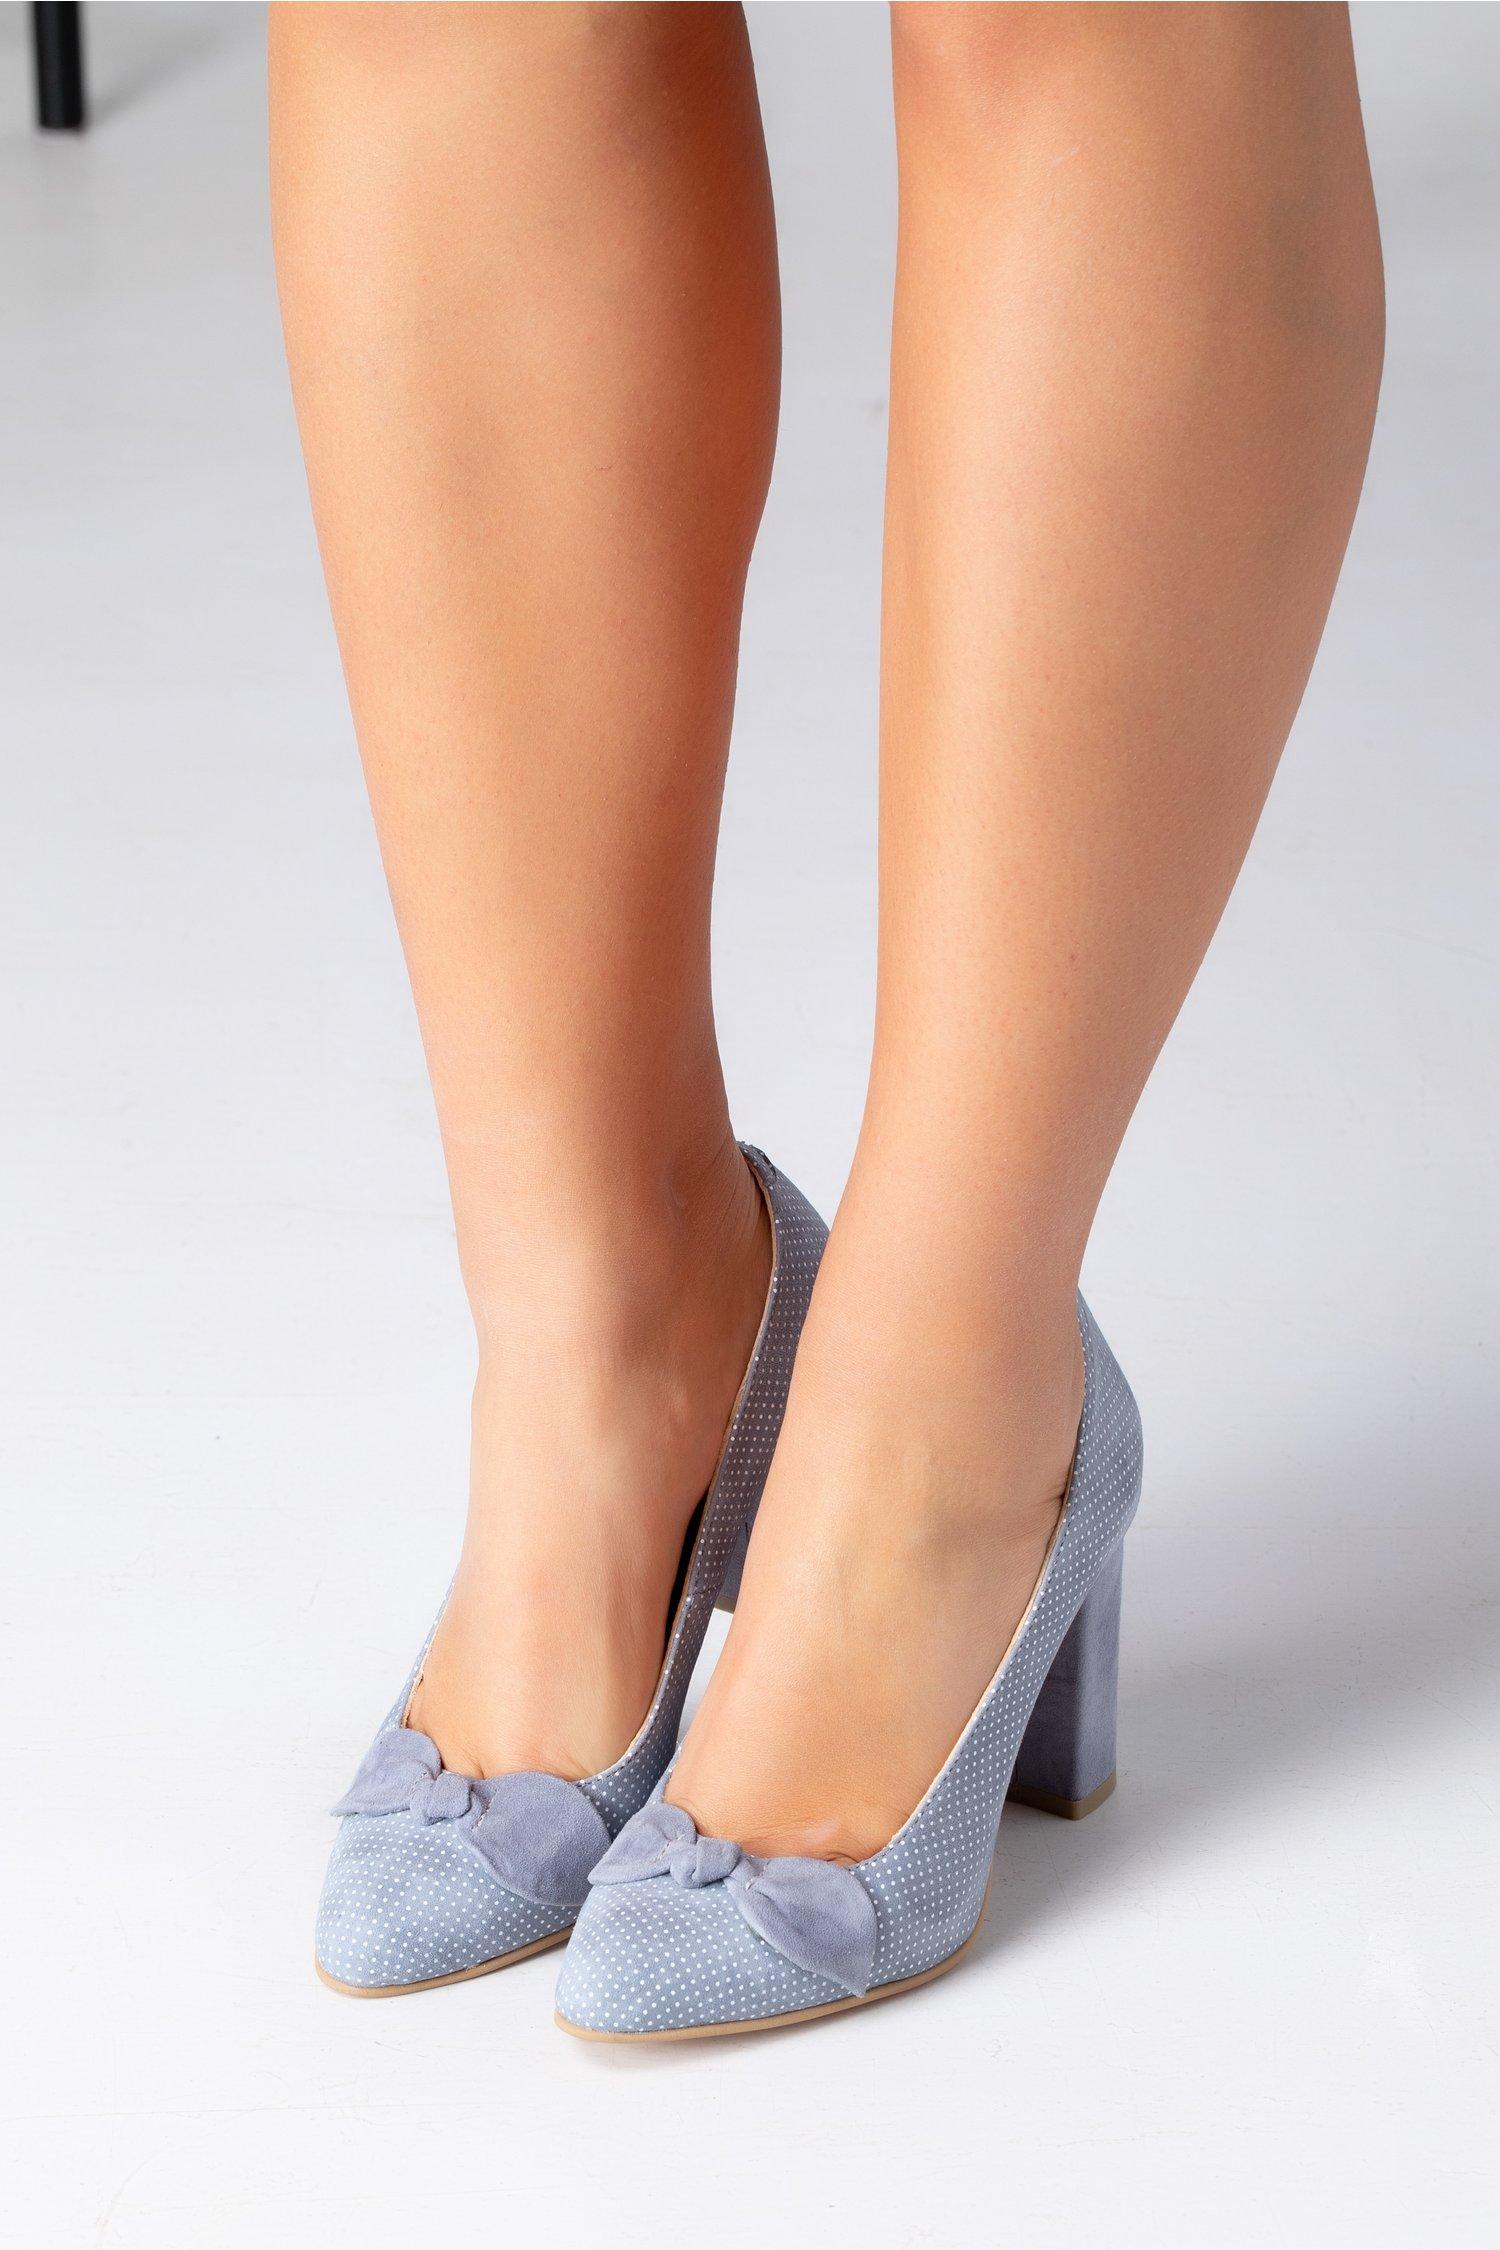 Pantofi Ely gri cu buline si fundita